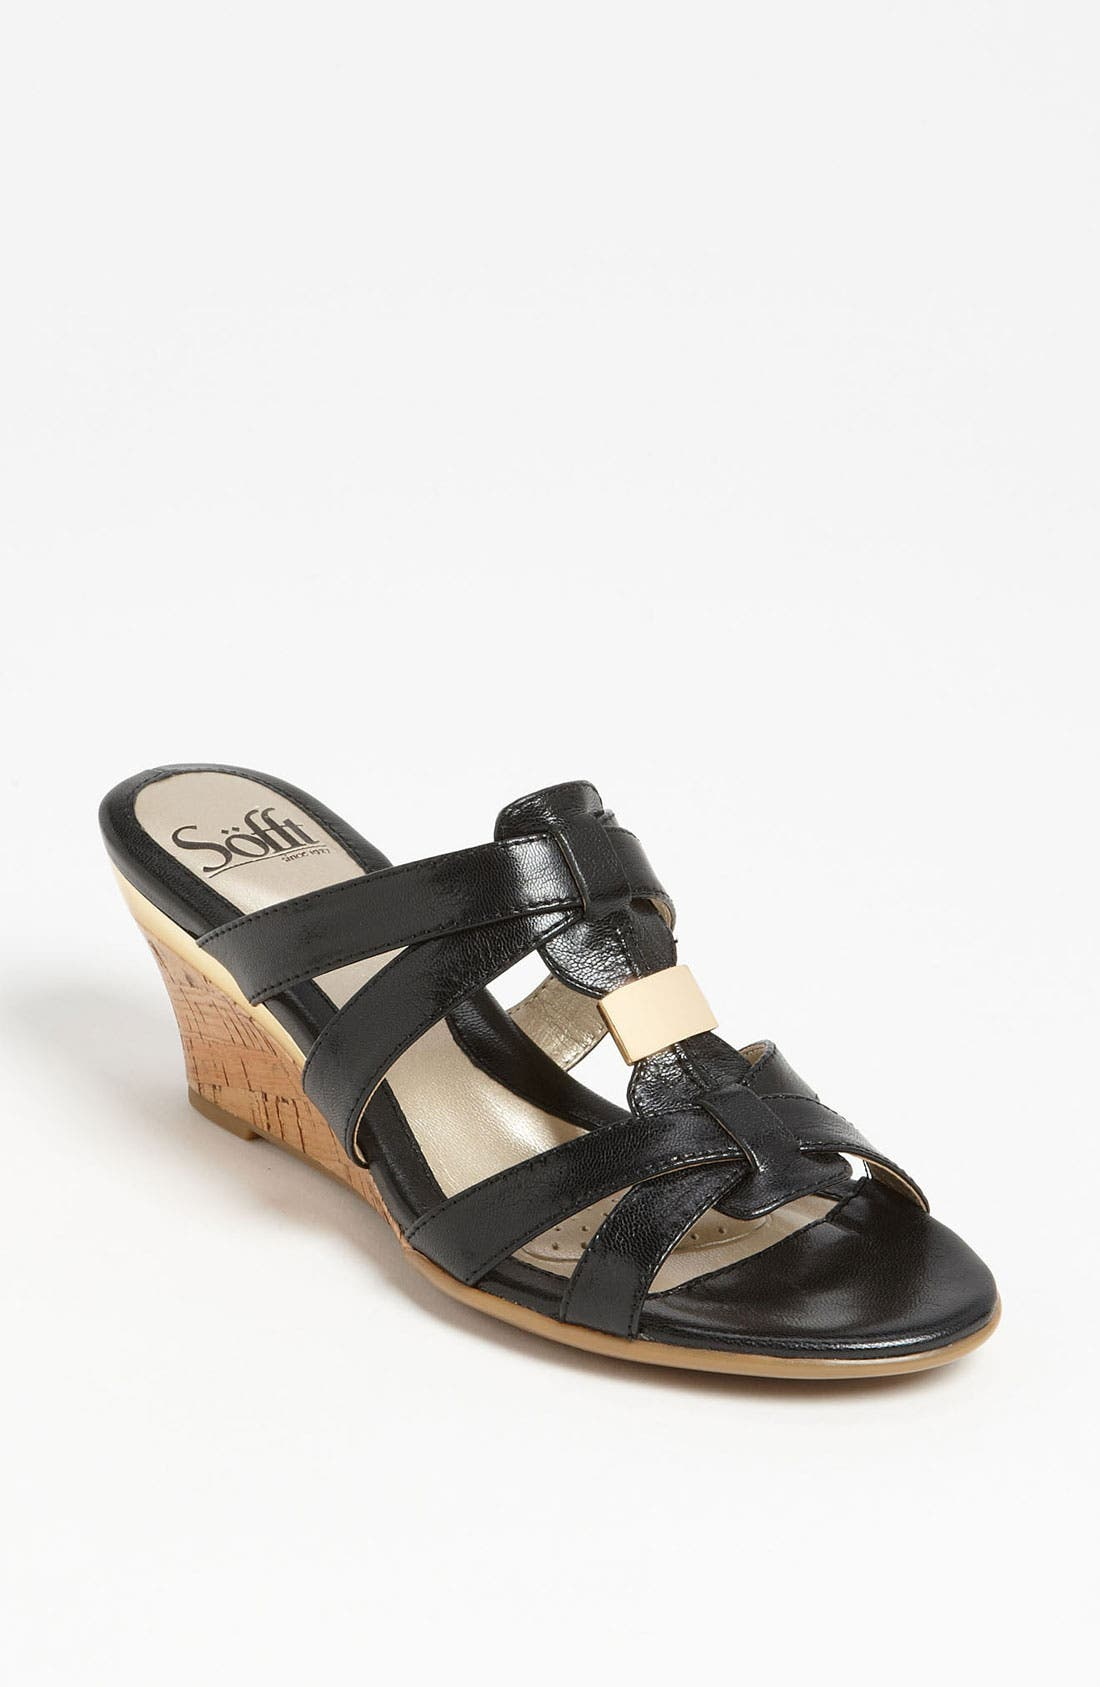 Main Image - Söfft 'Pestora' Sandal